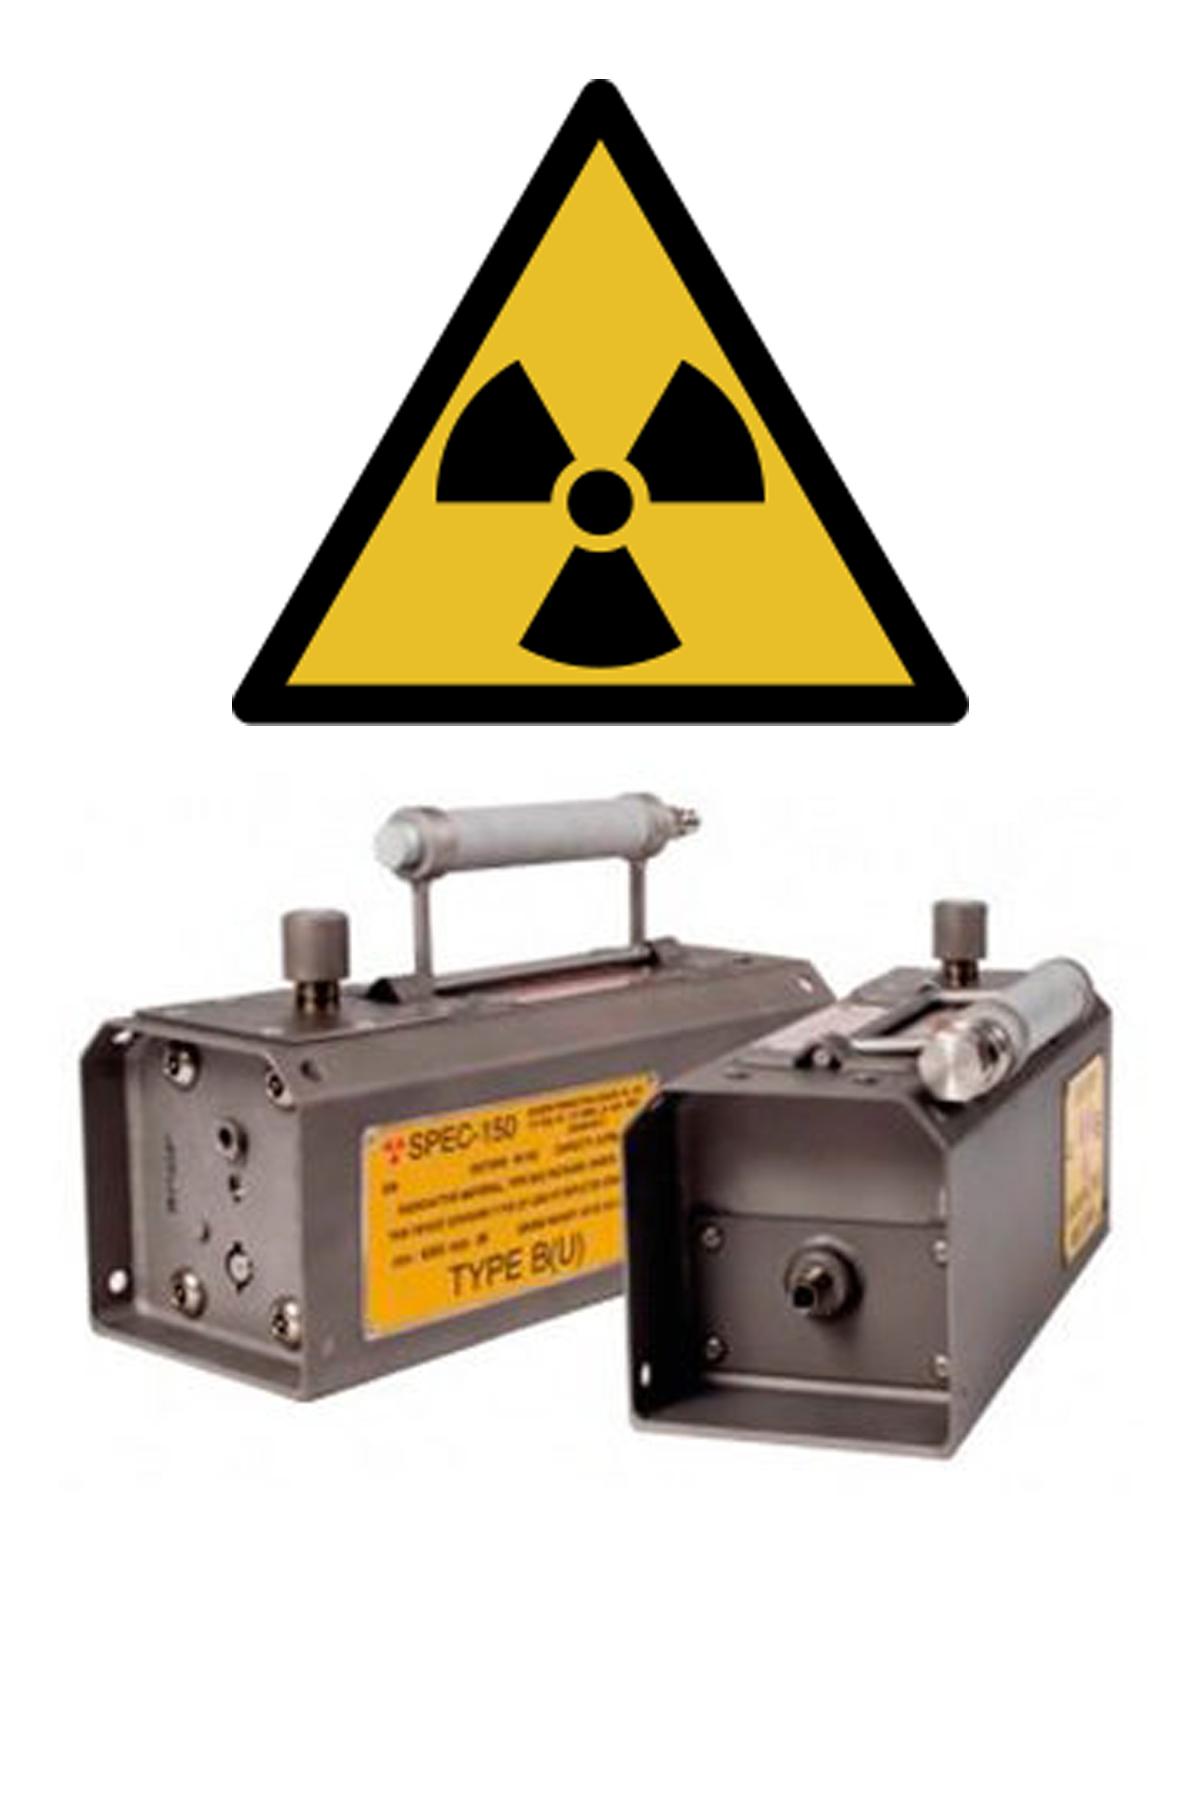 radioactivo-buscado